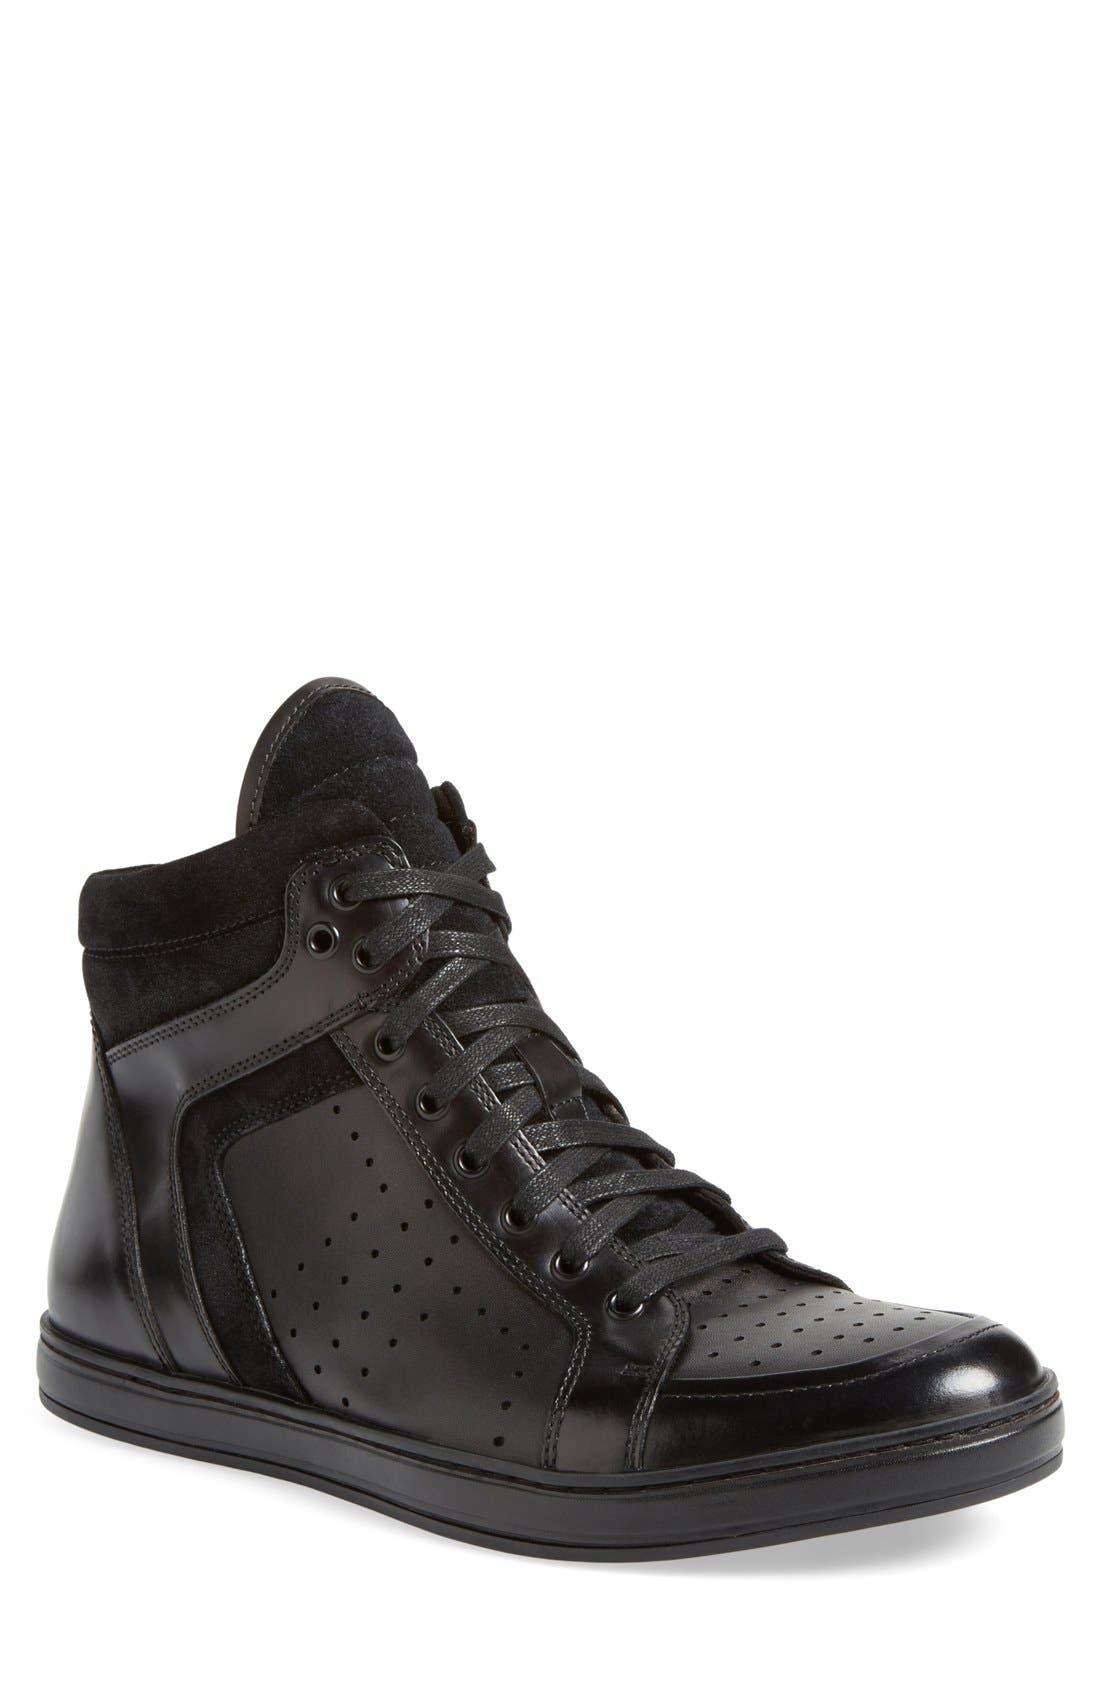 Main Image - Kenneth Cole New York 'Big Brand' Sneaker (Men)